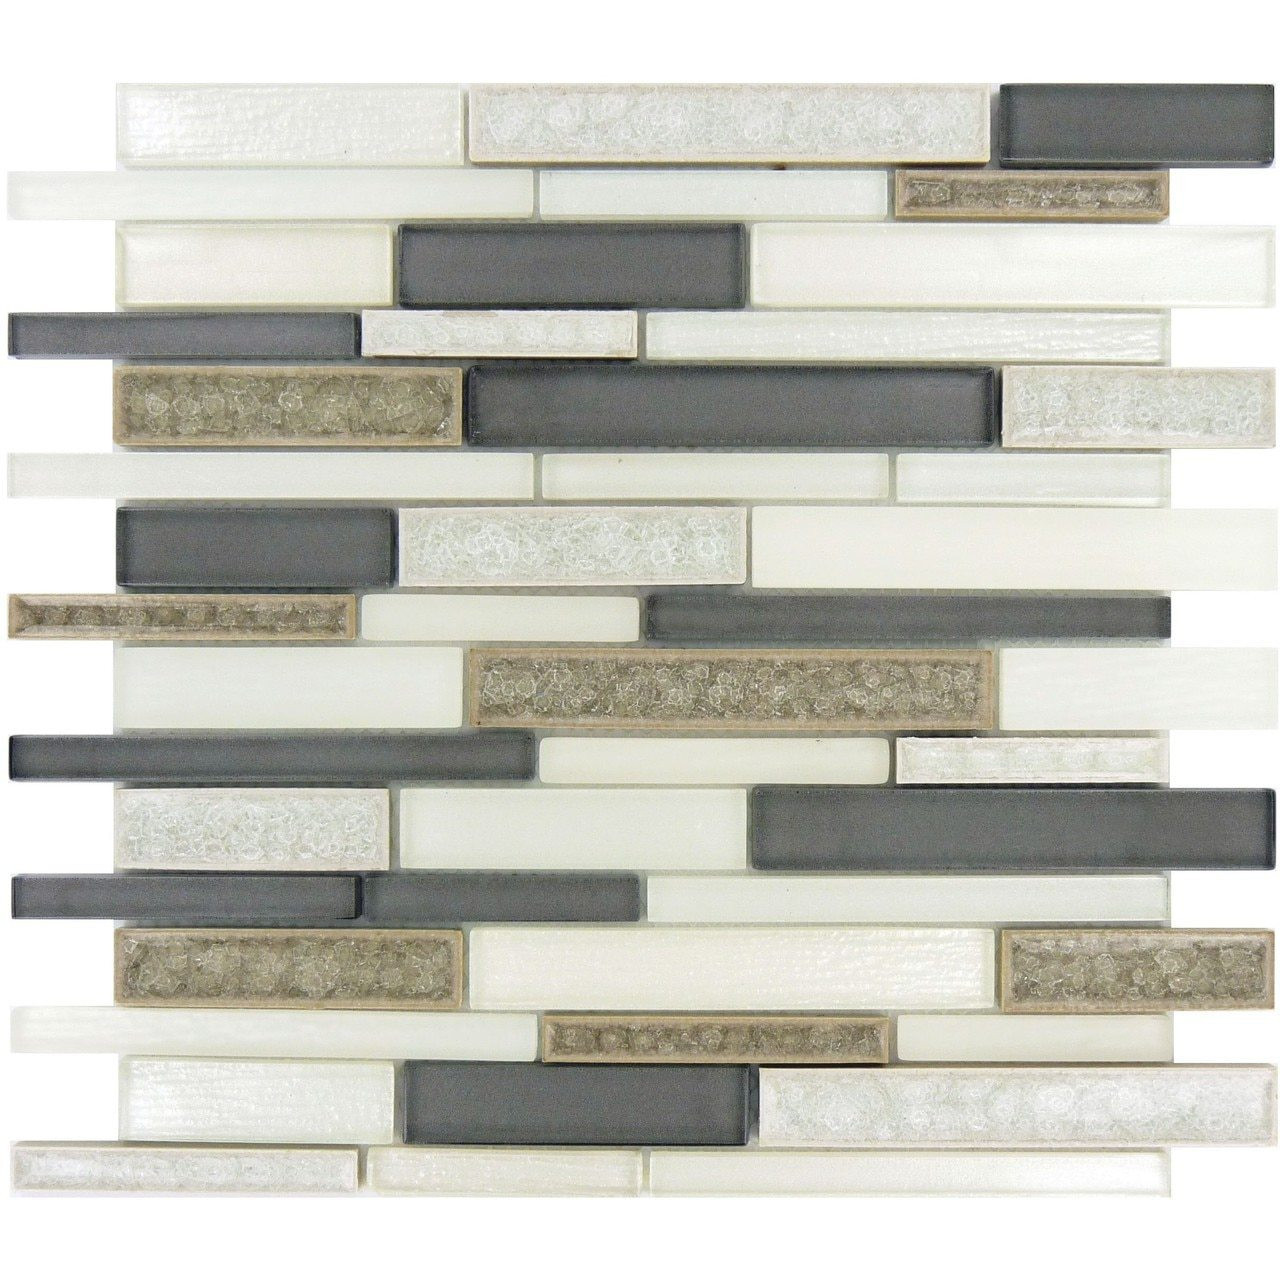 Bella Glass Tiles Bella Muro Series Sutton Frost